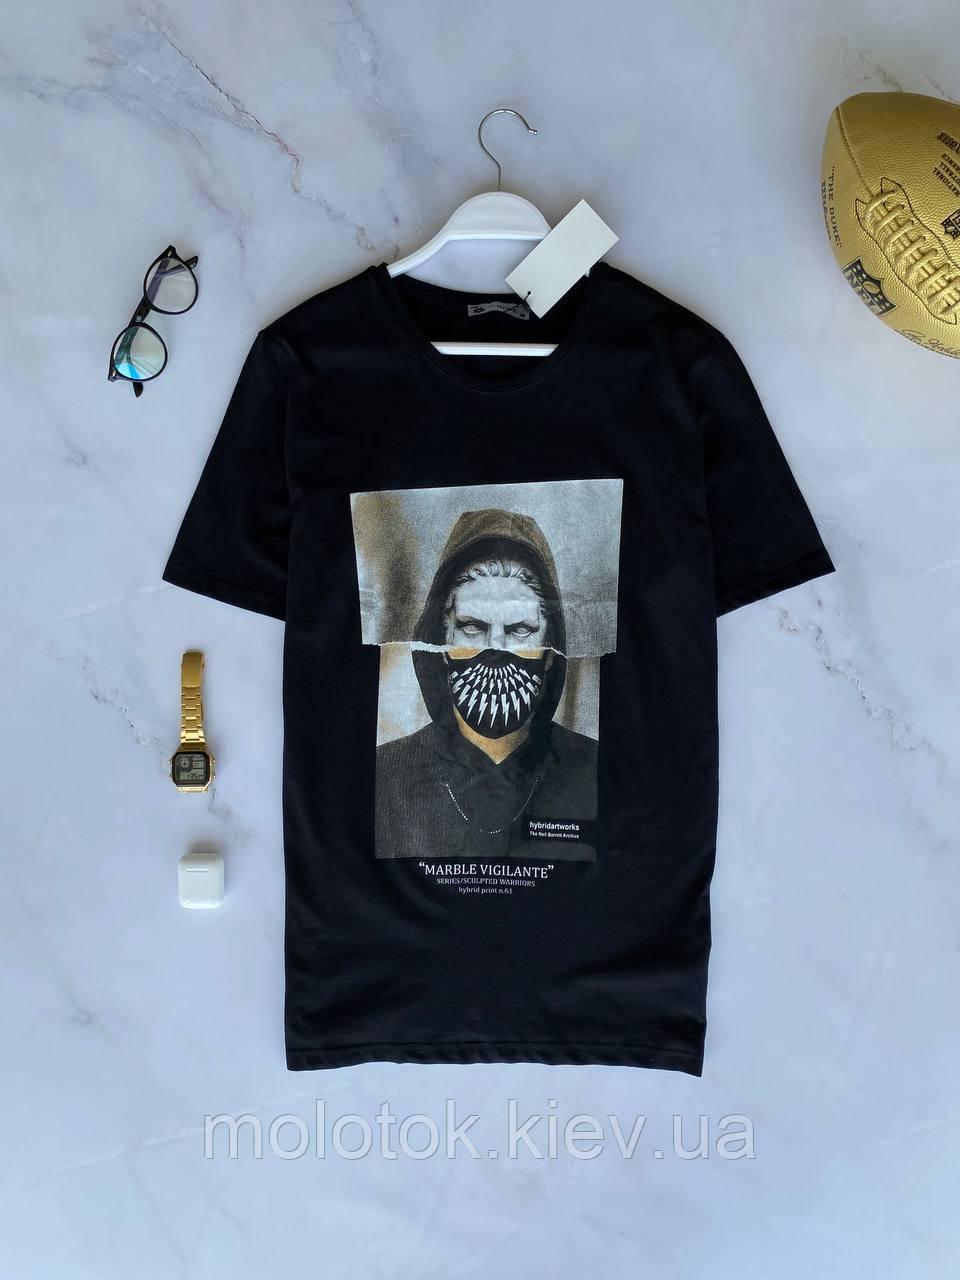 Мужская летняя футболка черная